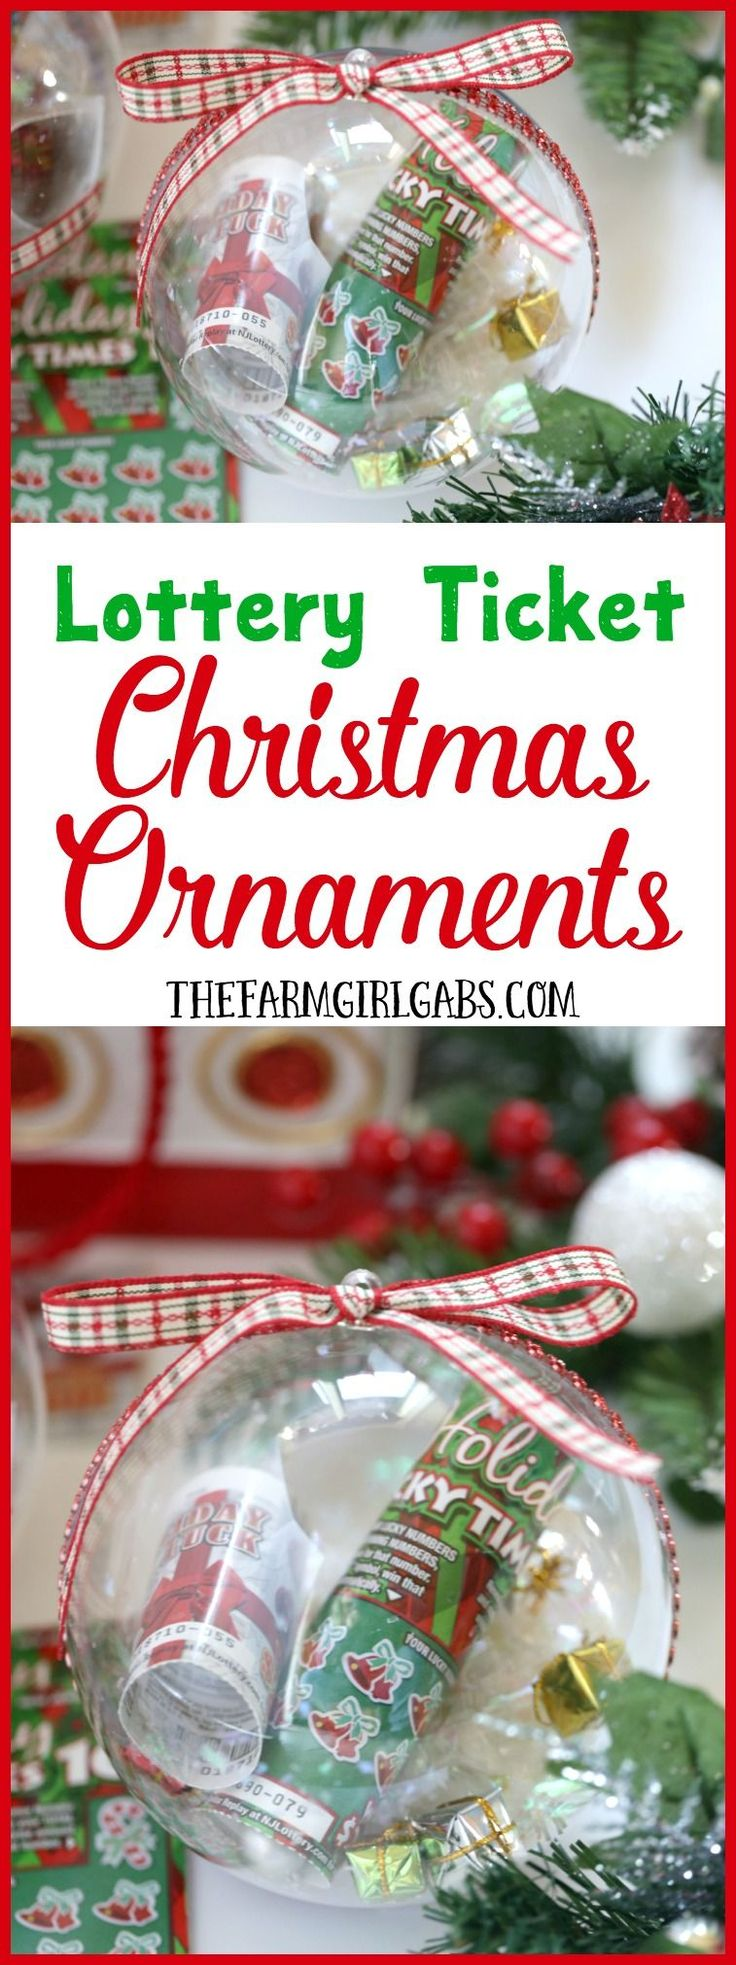 The 25+ best Lottery ticket christmas gift ideas on Pinterest ...